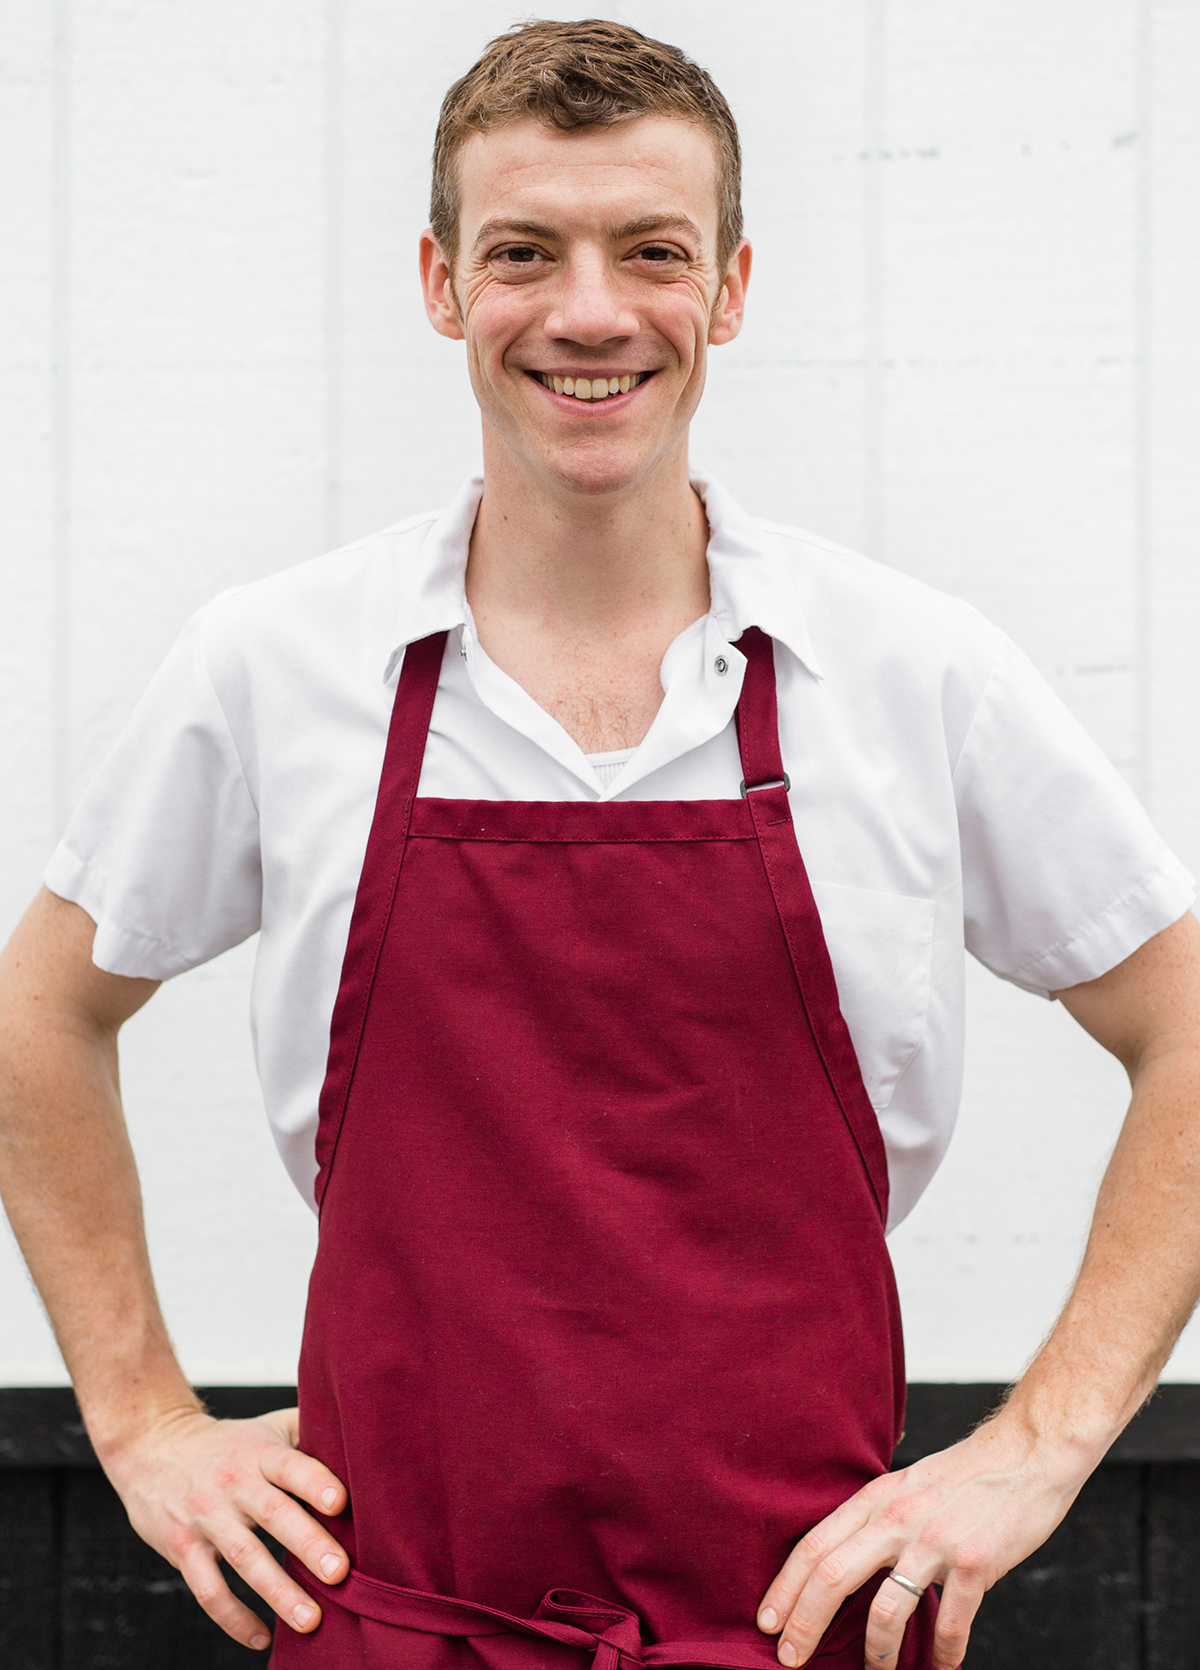 Chef Carl Dooley